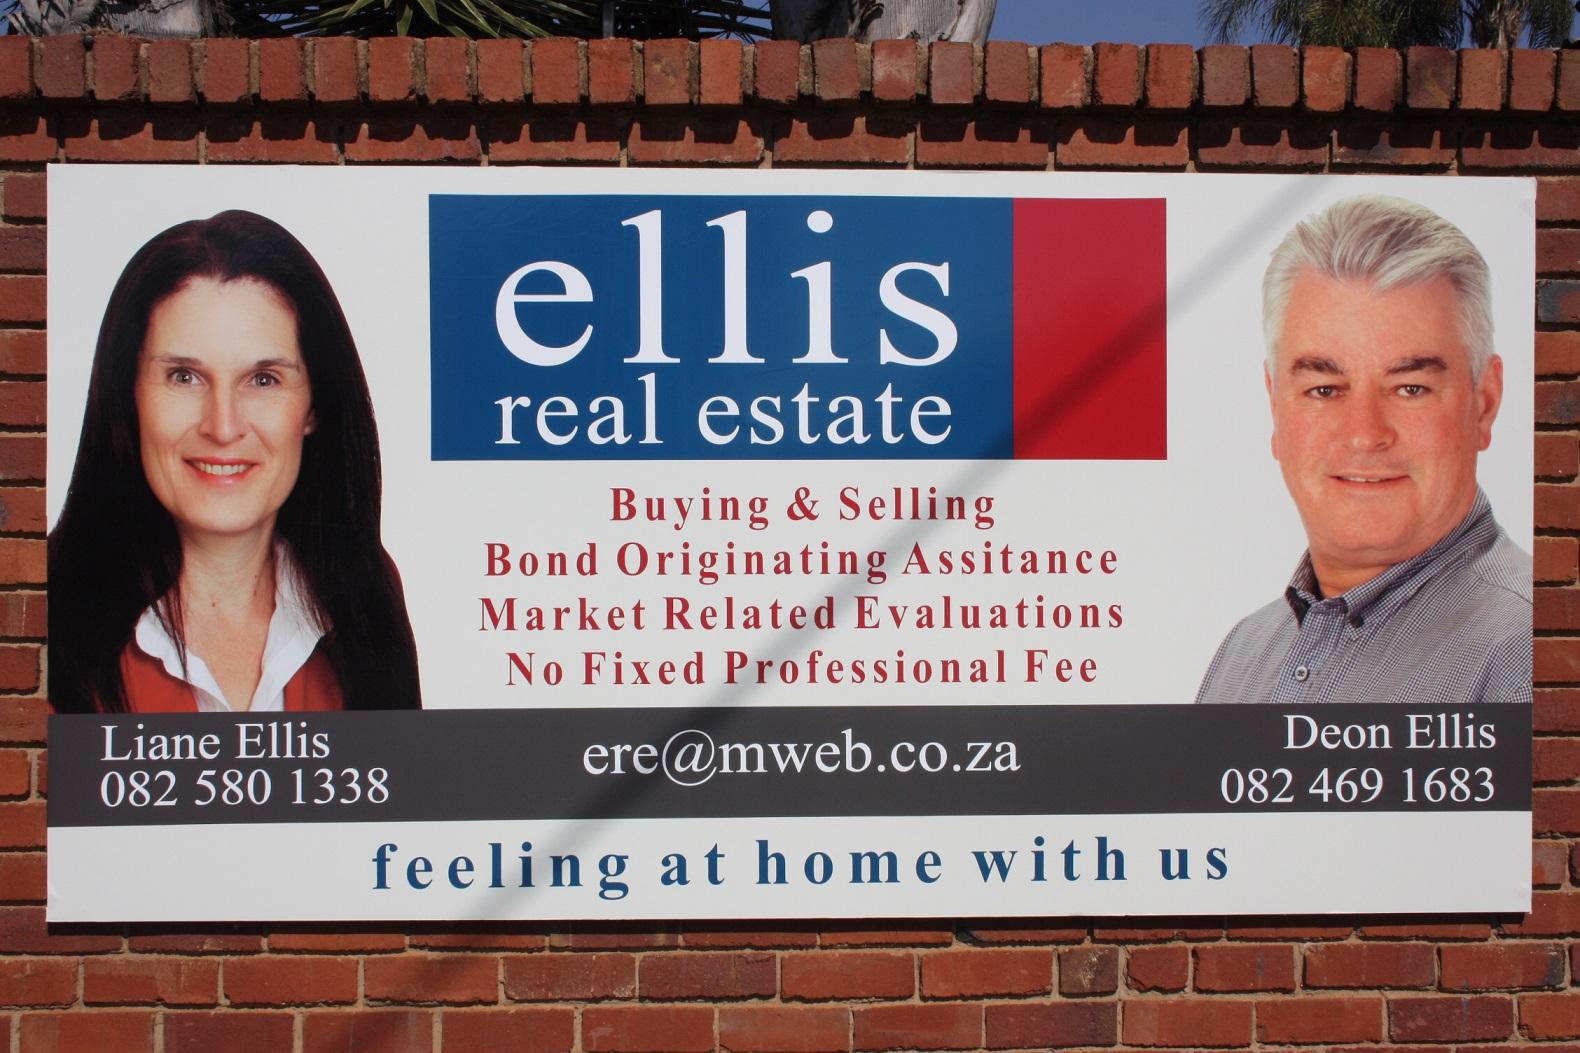 Foto de Ellis Real Estate (Pty) Ltd